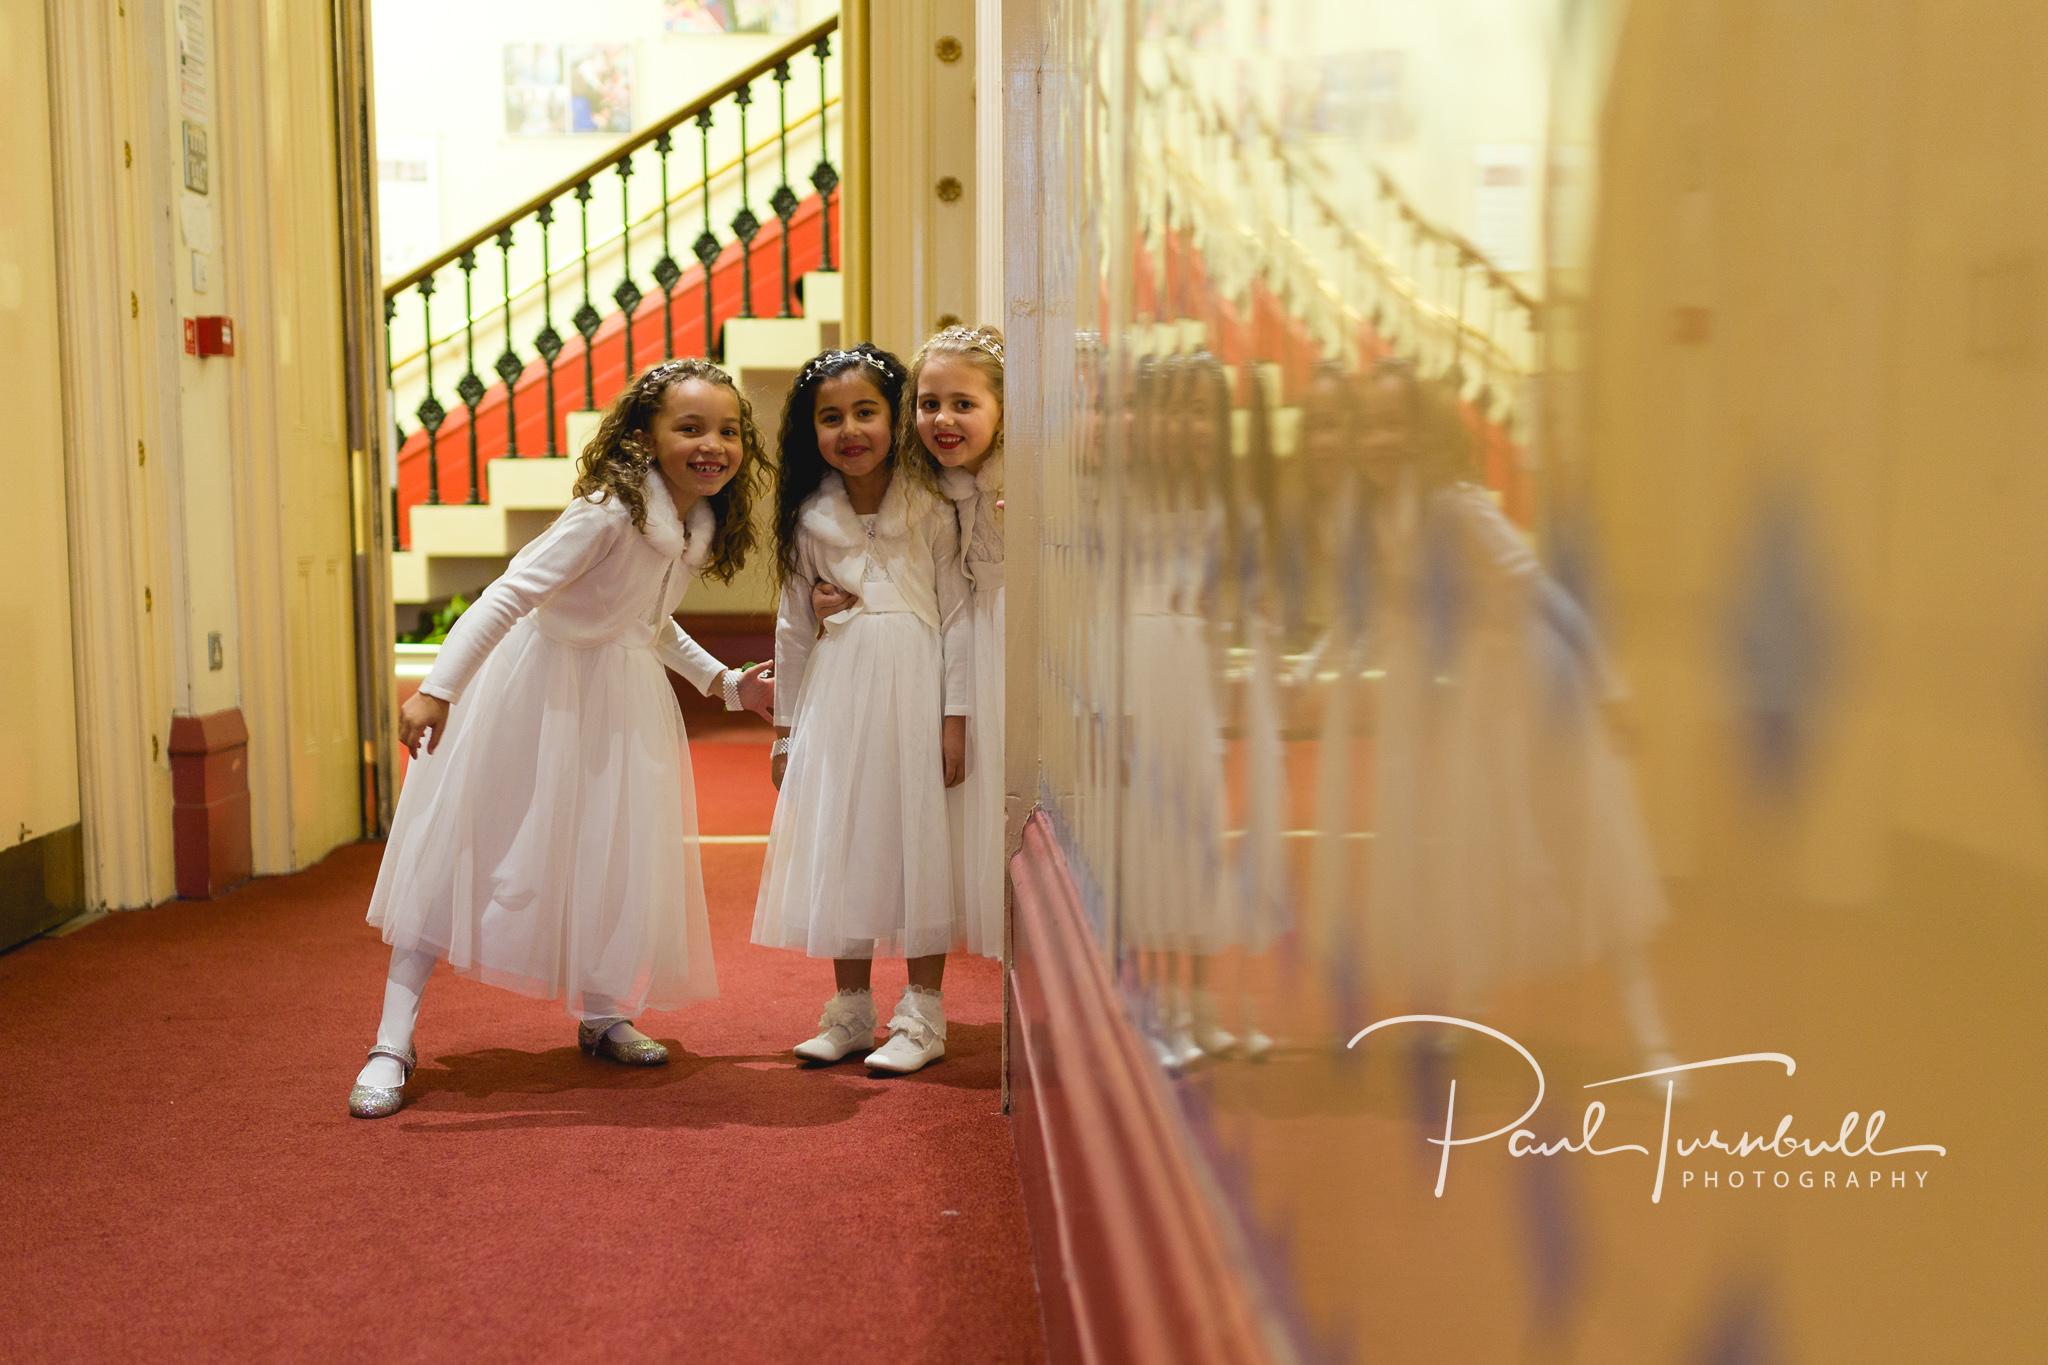 wedding-photographer-leeds-town-hall-021.jpg